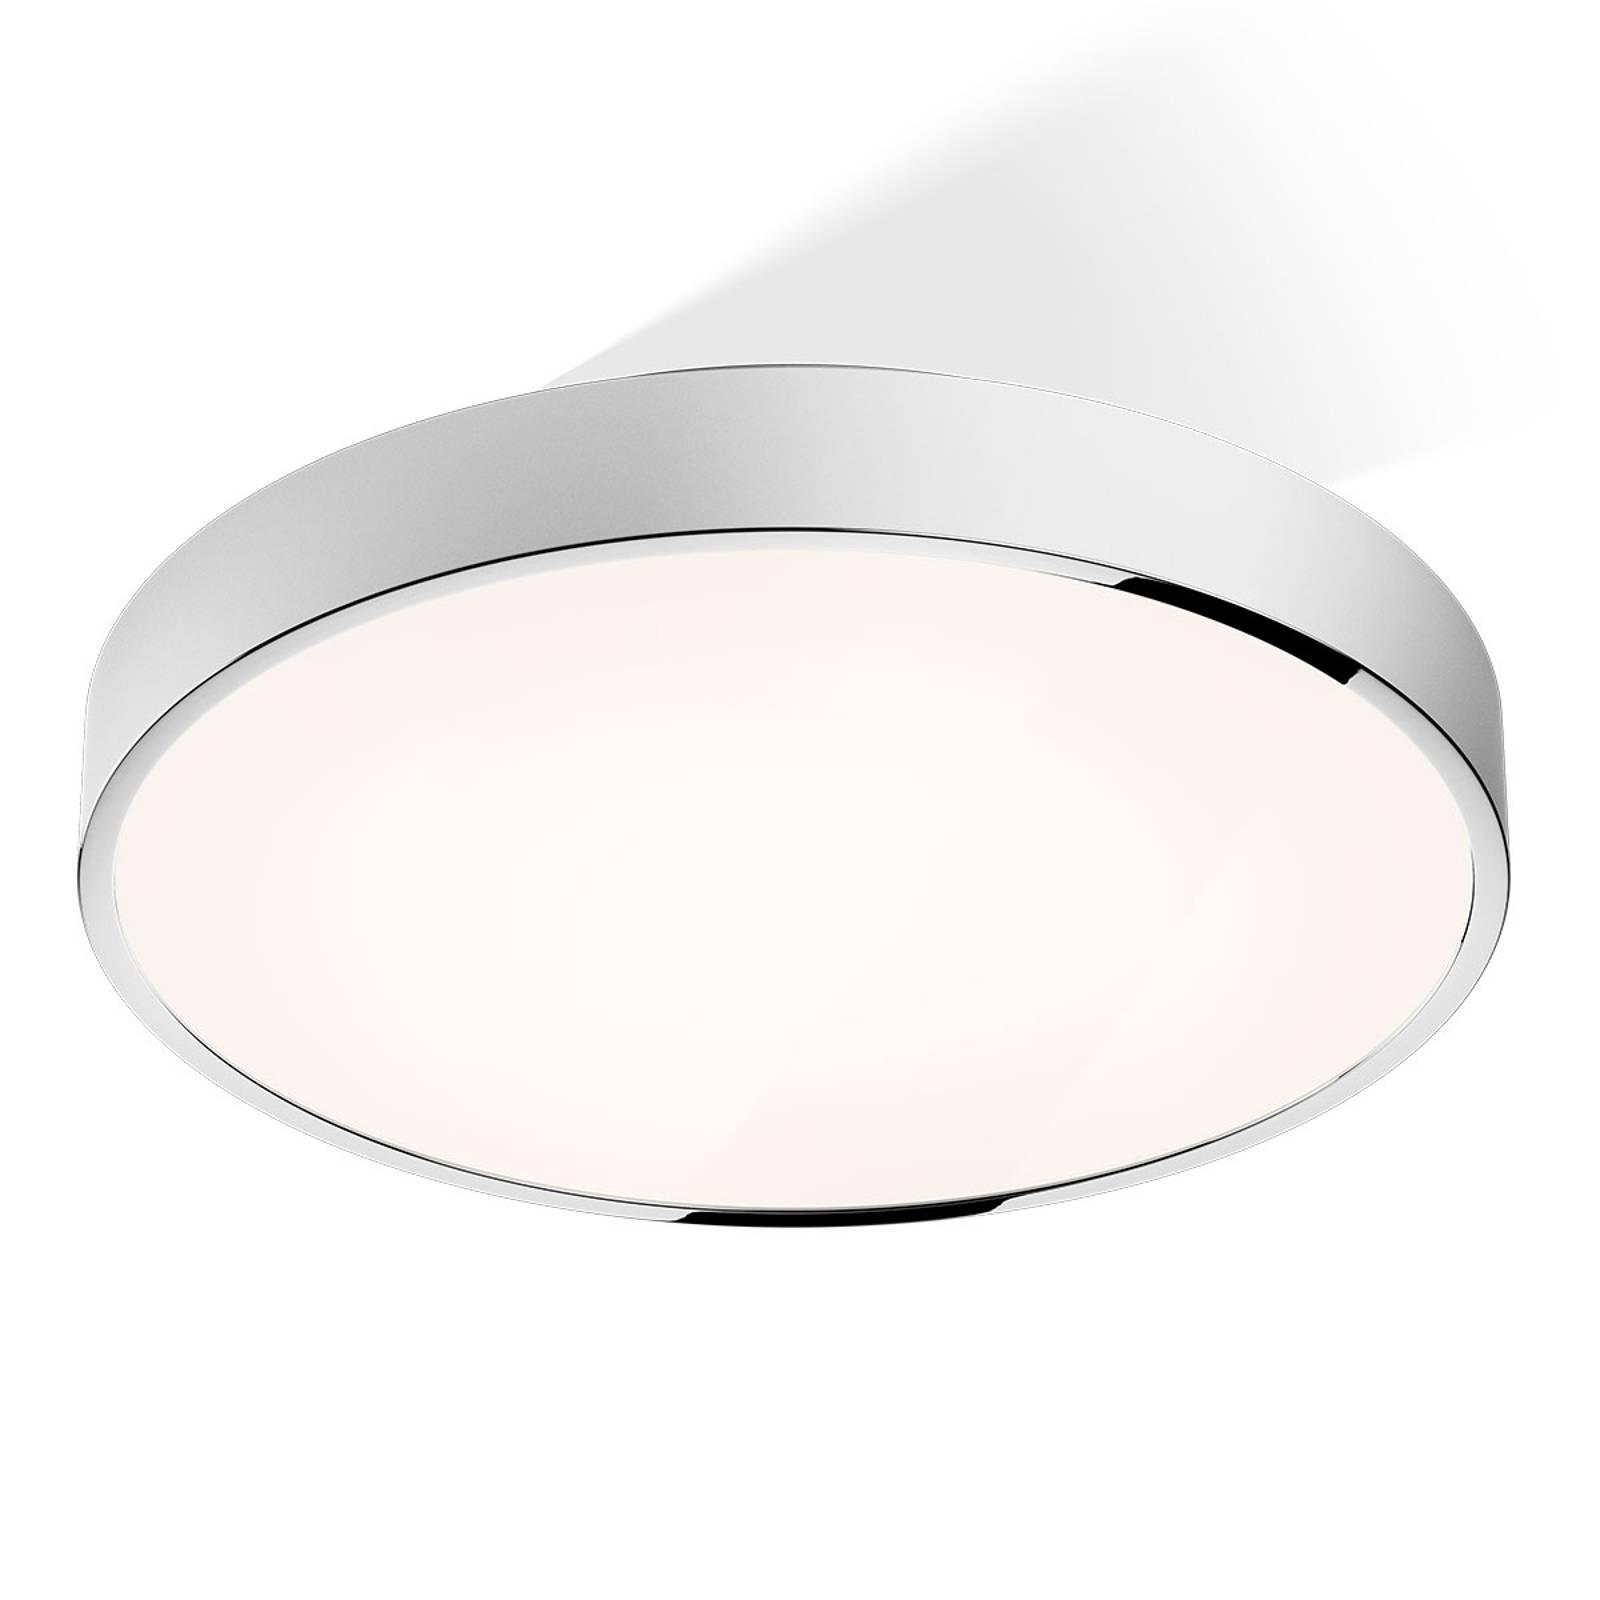 Decor Walther Round plafondlamp Ø 45 cm chroom